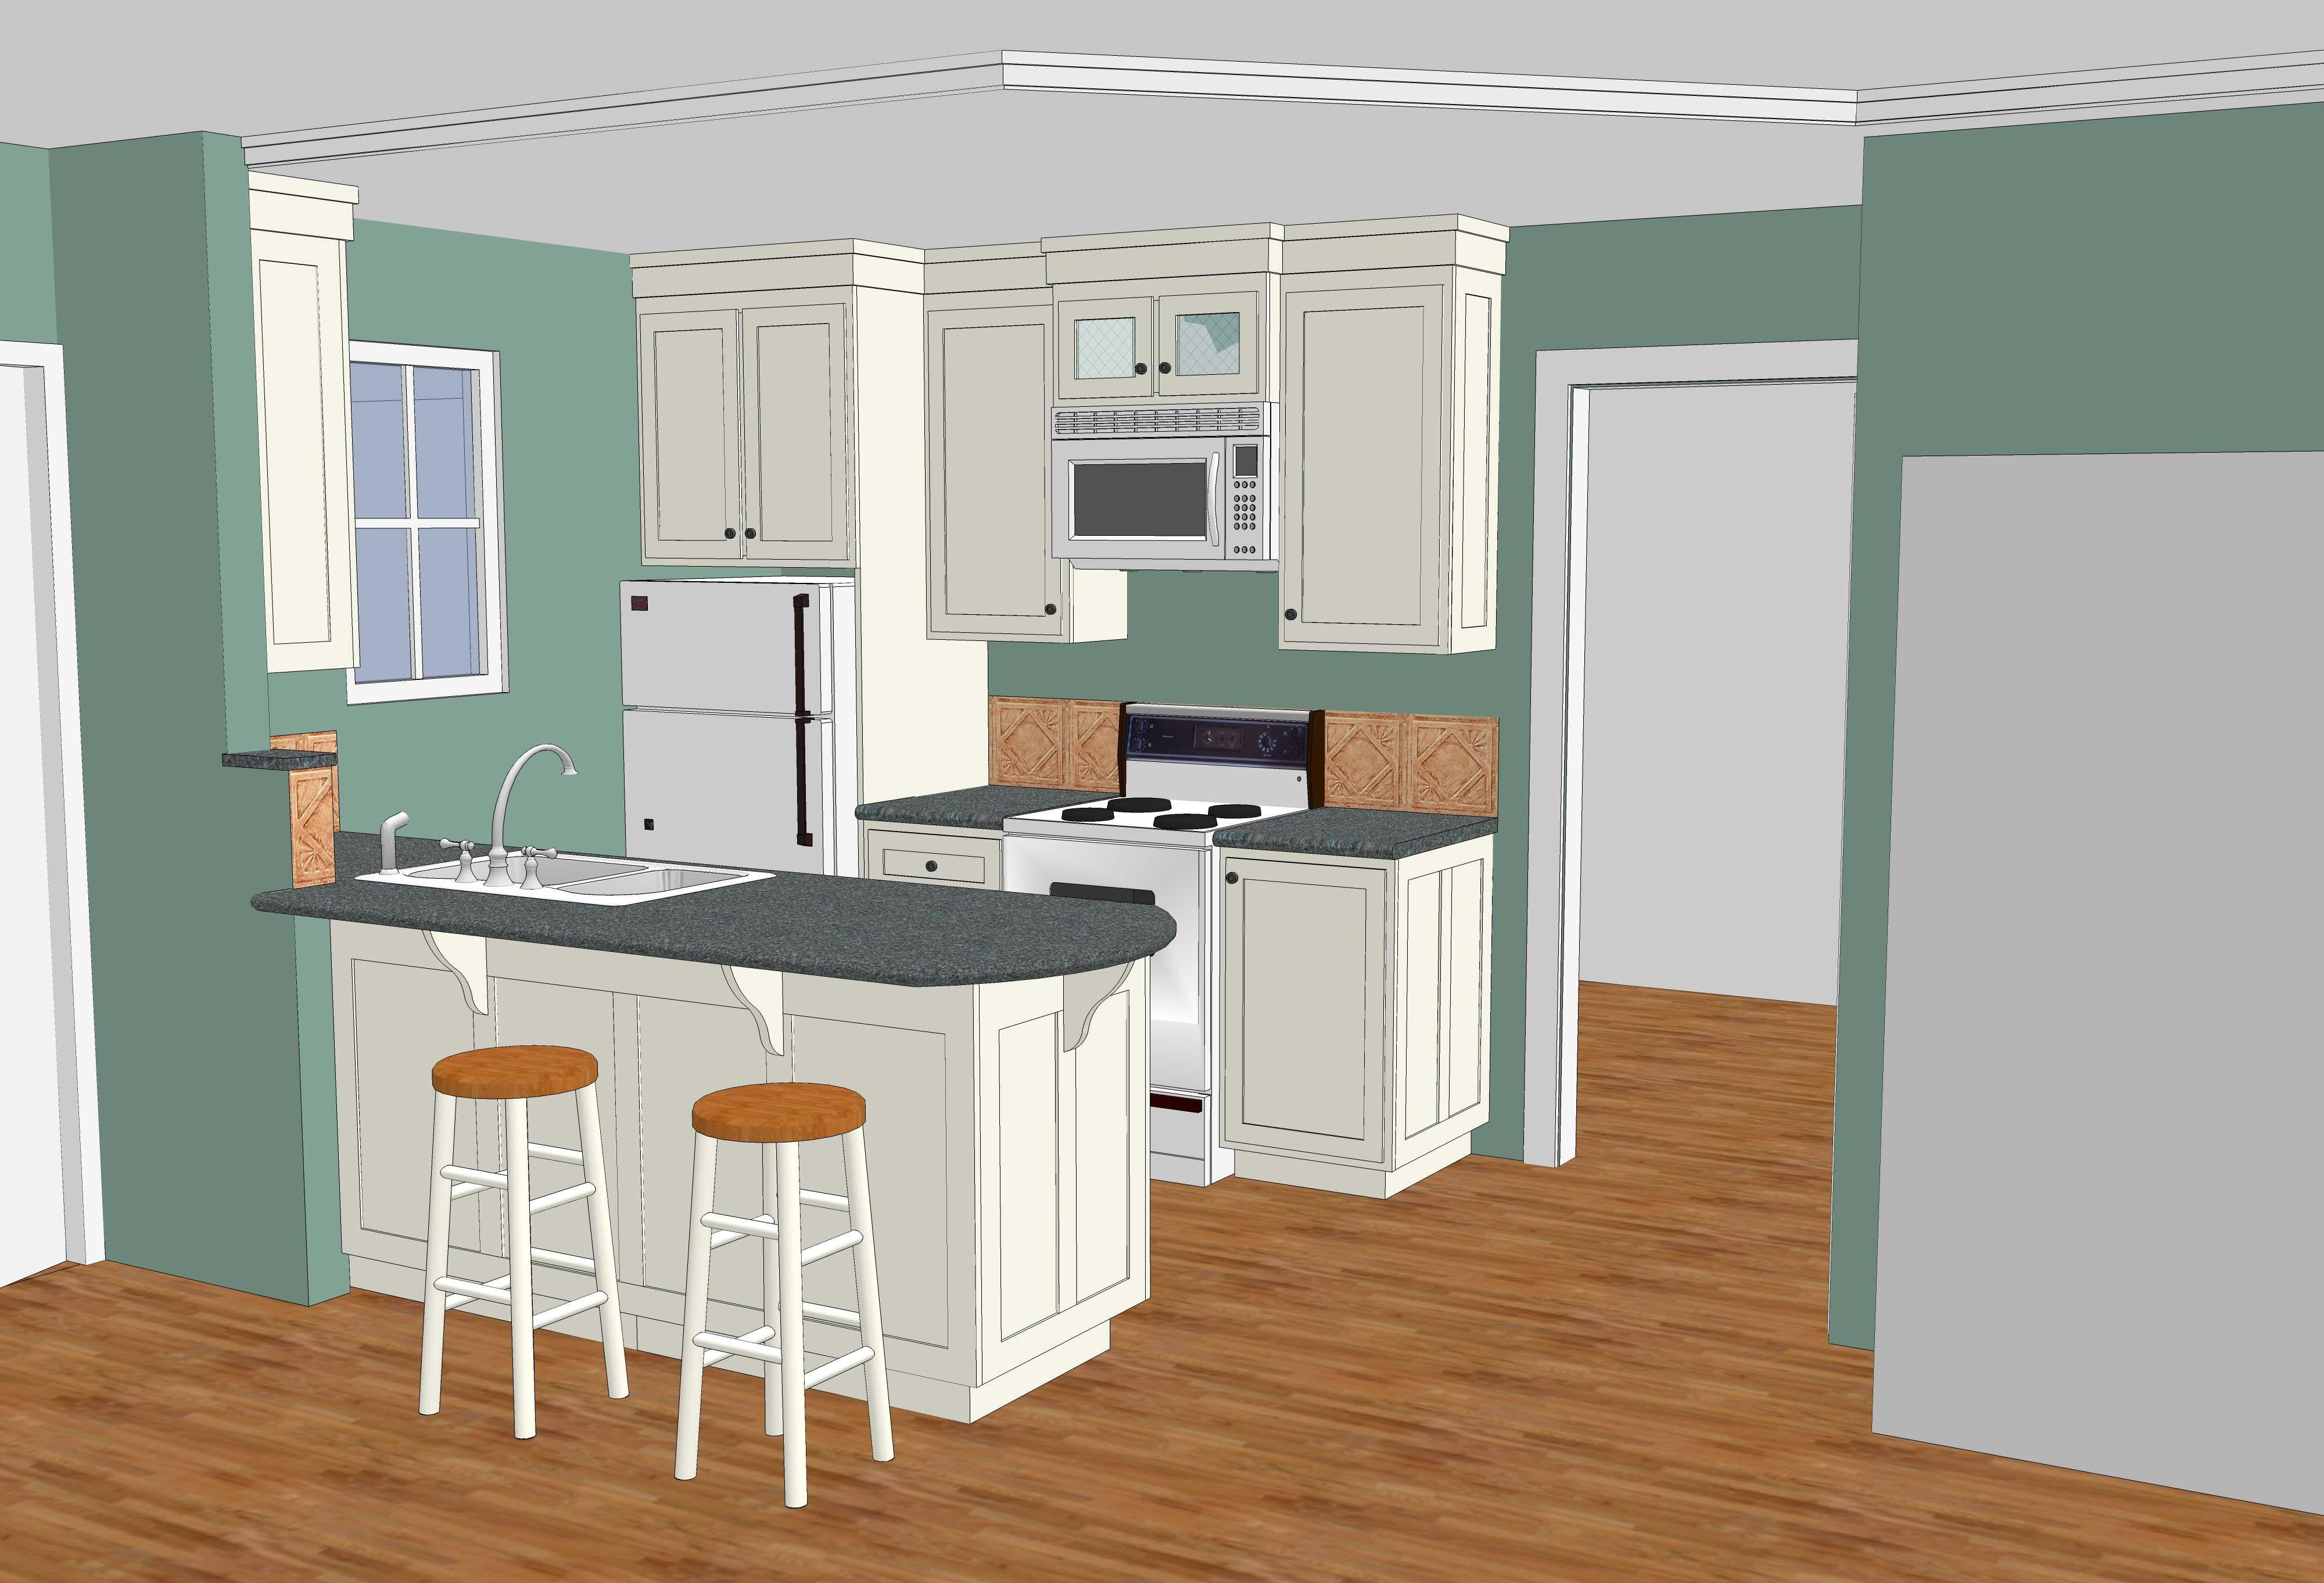 sketchup pro construction forum pro kitchen design cad sketchup ...